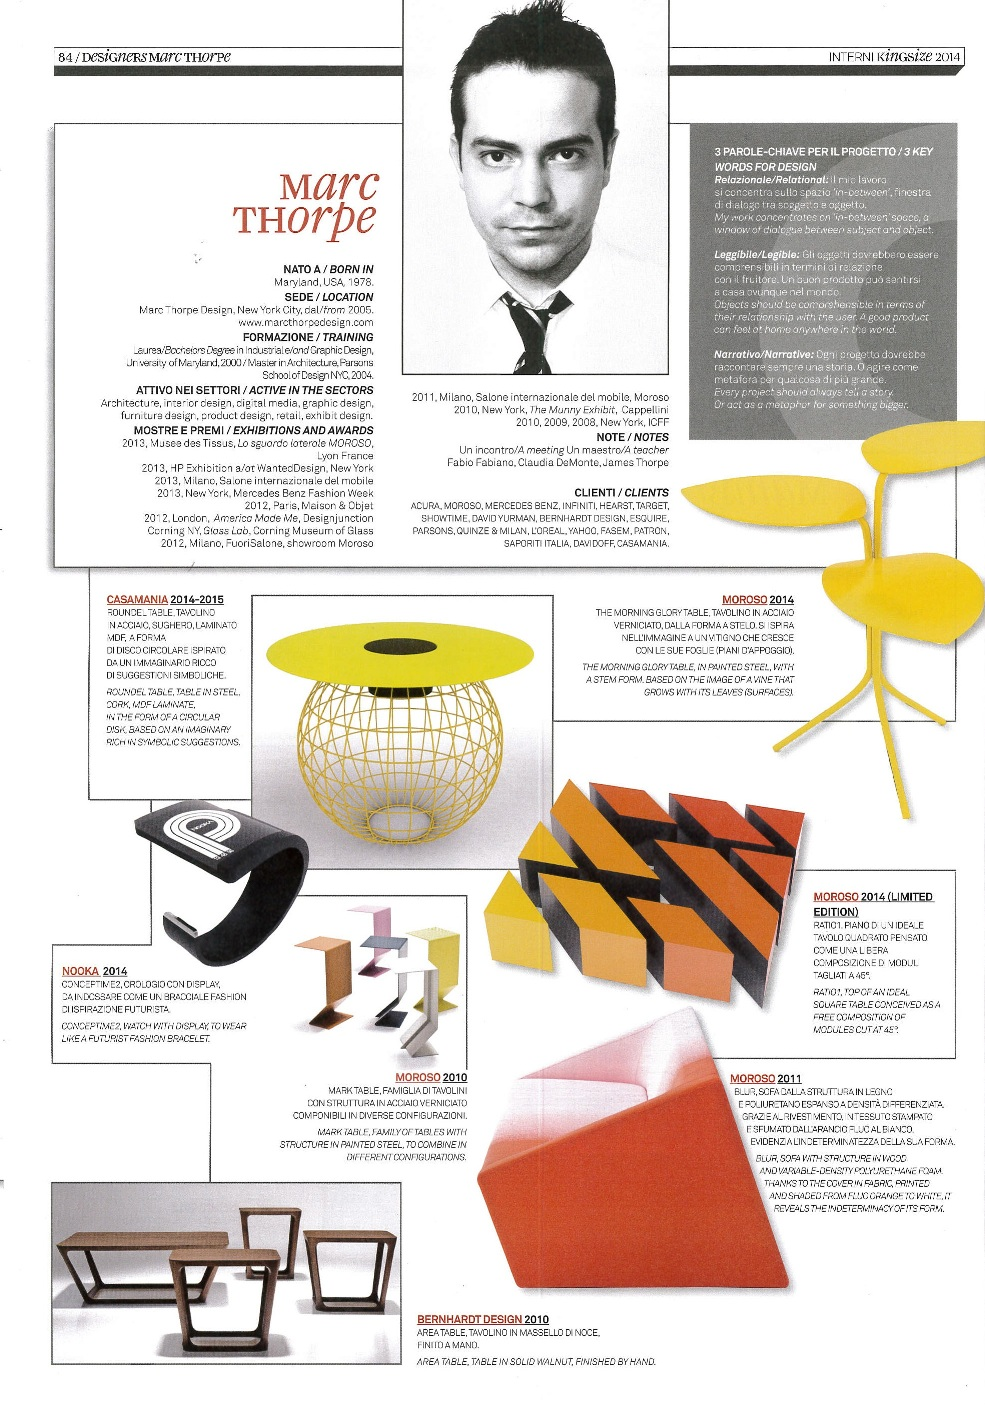 dedece interni young designers salone 2014 (9)